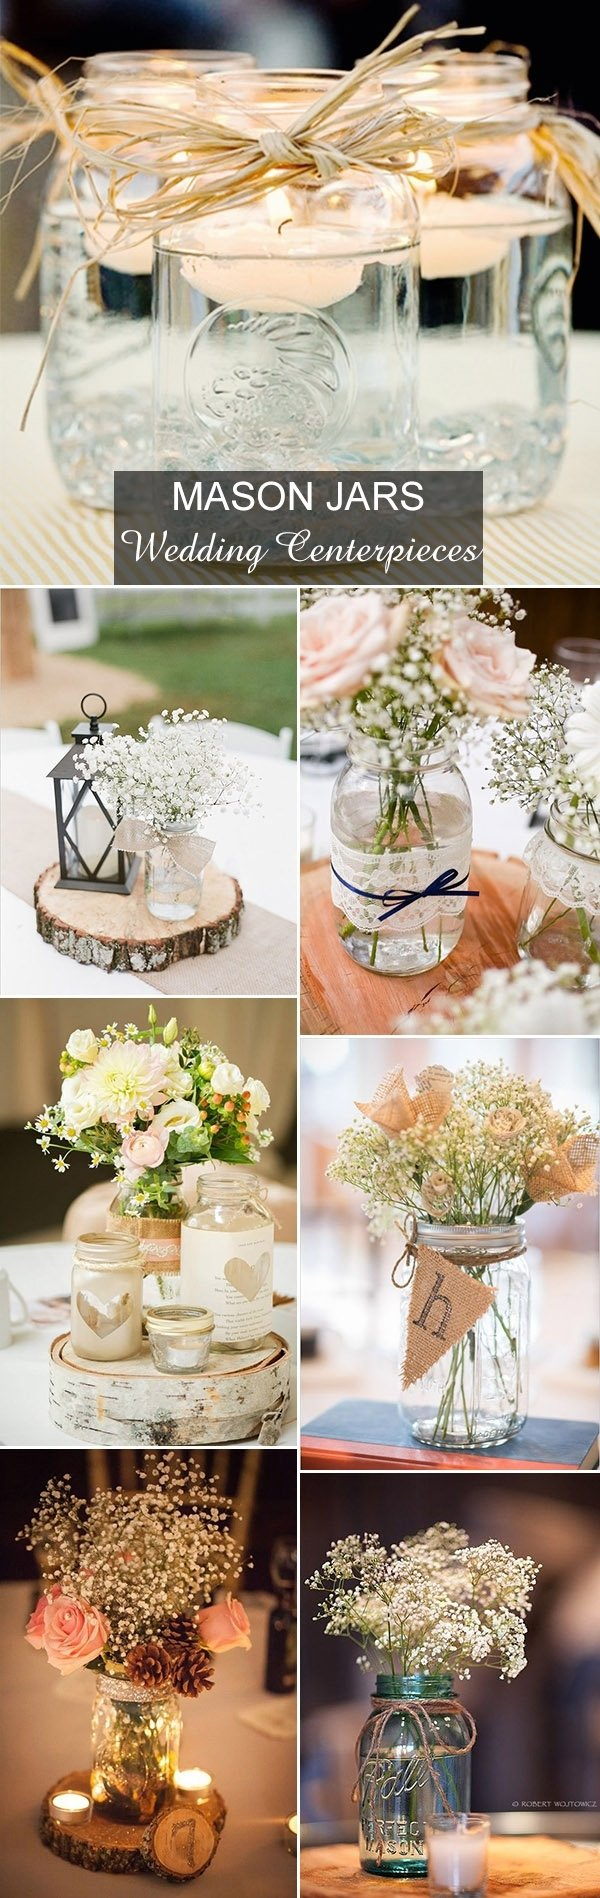 10 Fantastic Country Wedding Ideas Mason Jars rustic wedding ideas 30 ways to use mason jars 2 2020